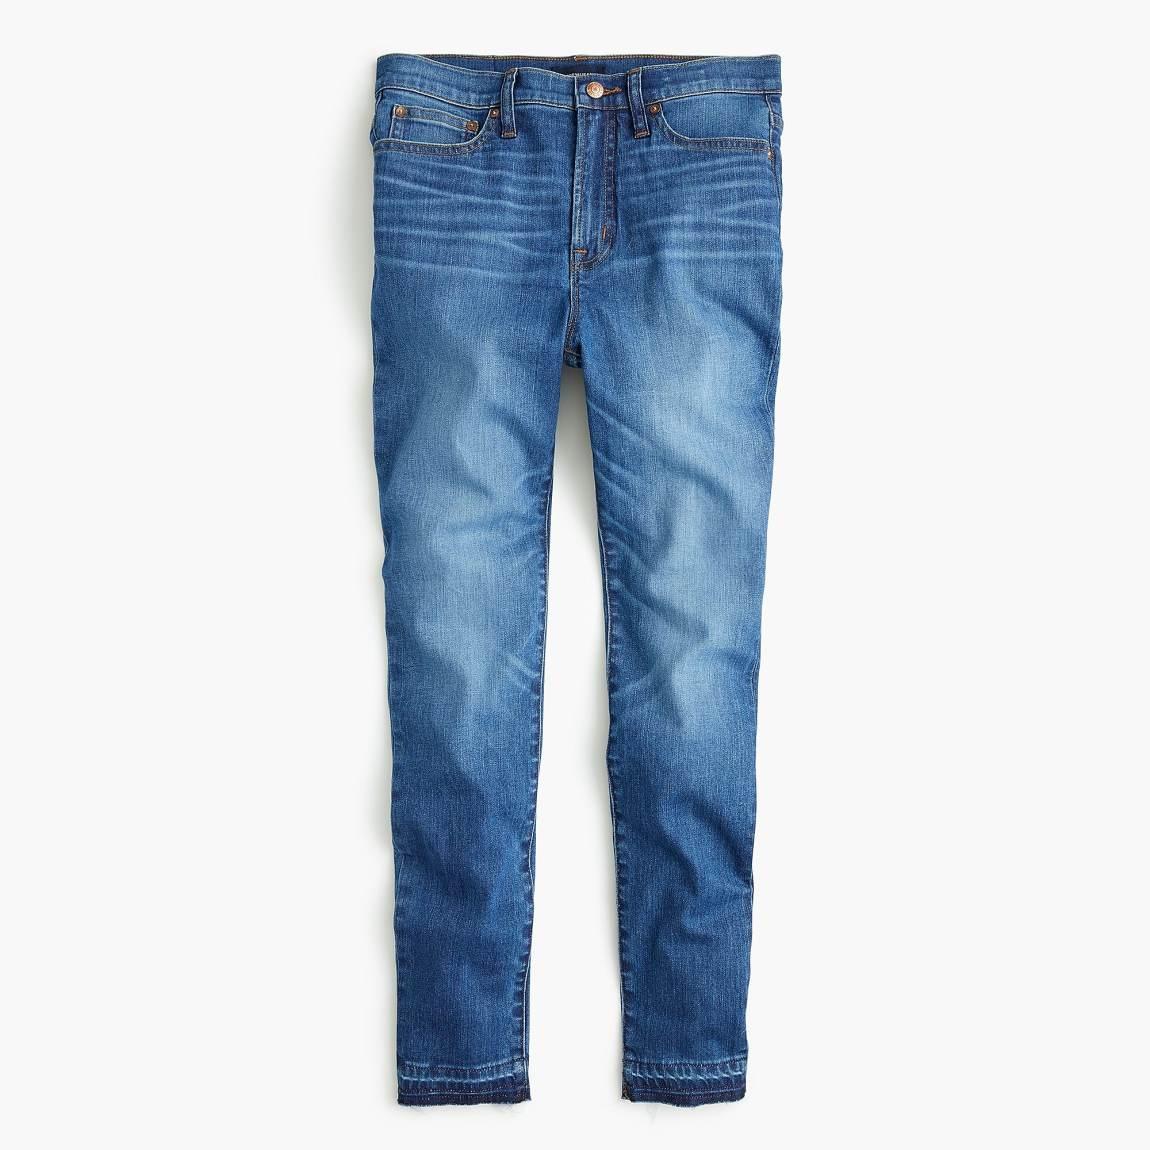 j. crew, skinny jeans, released hem, cropped jeans